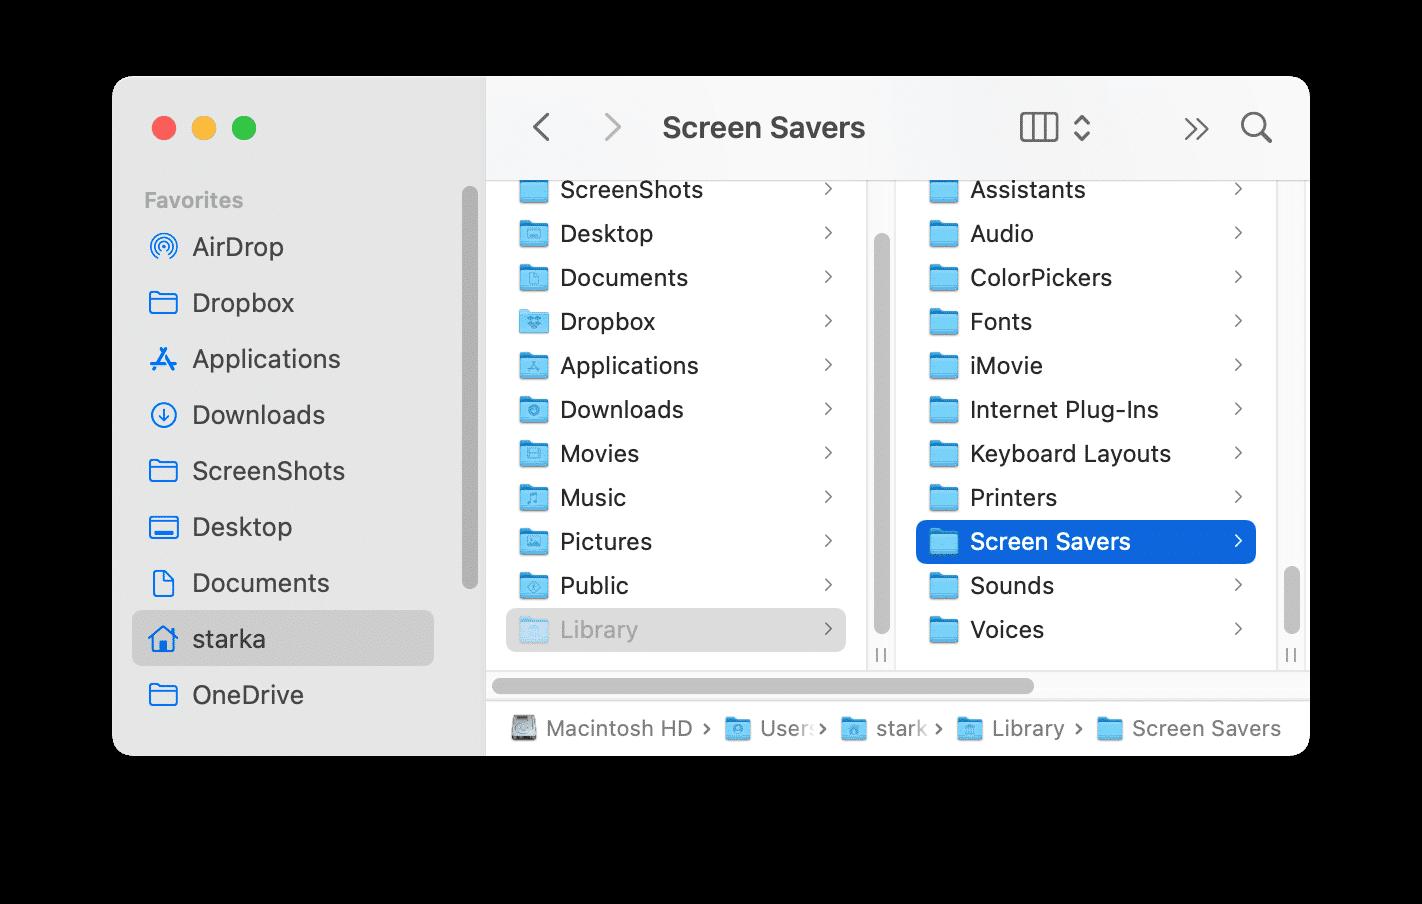 Finder window showing the Screen Savers folder